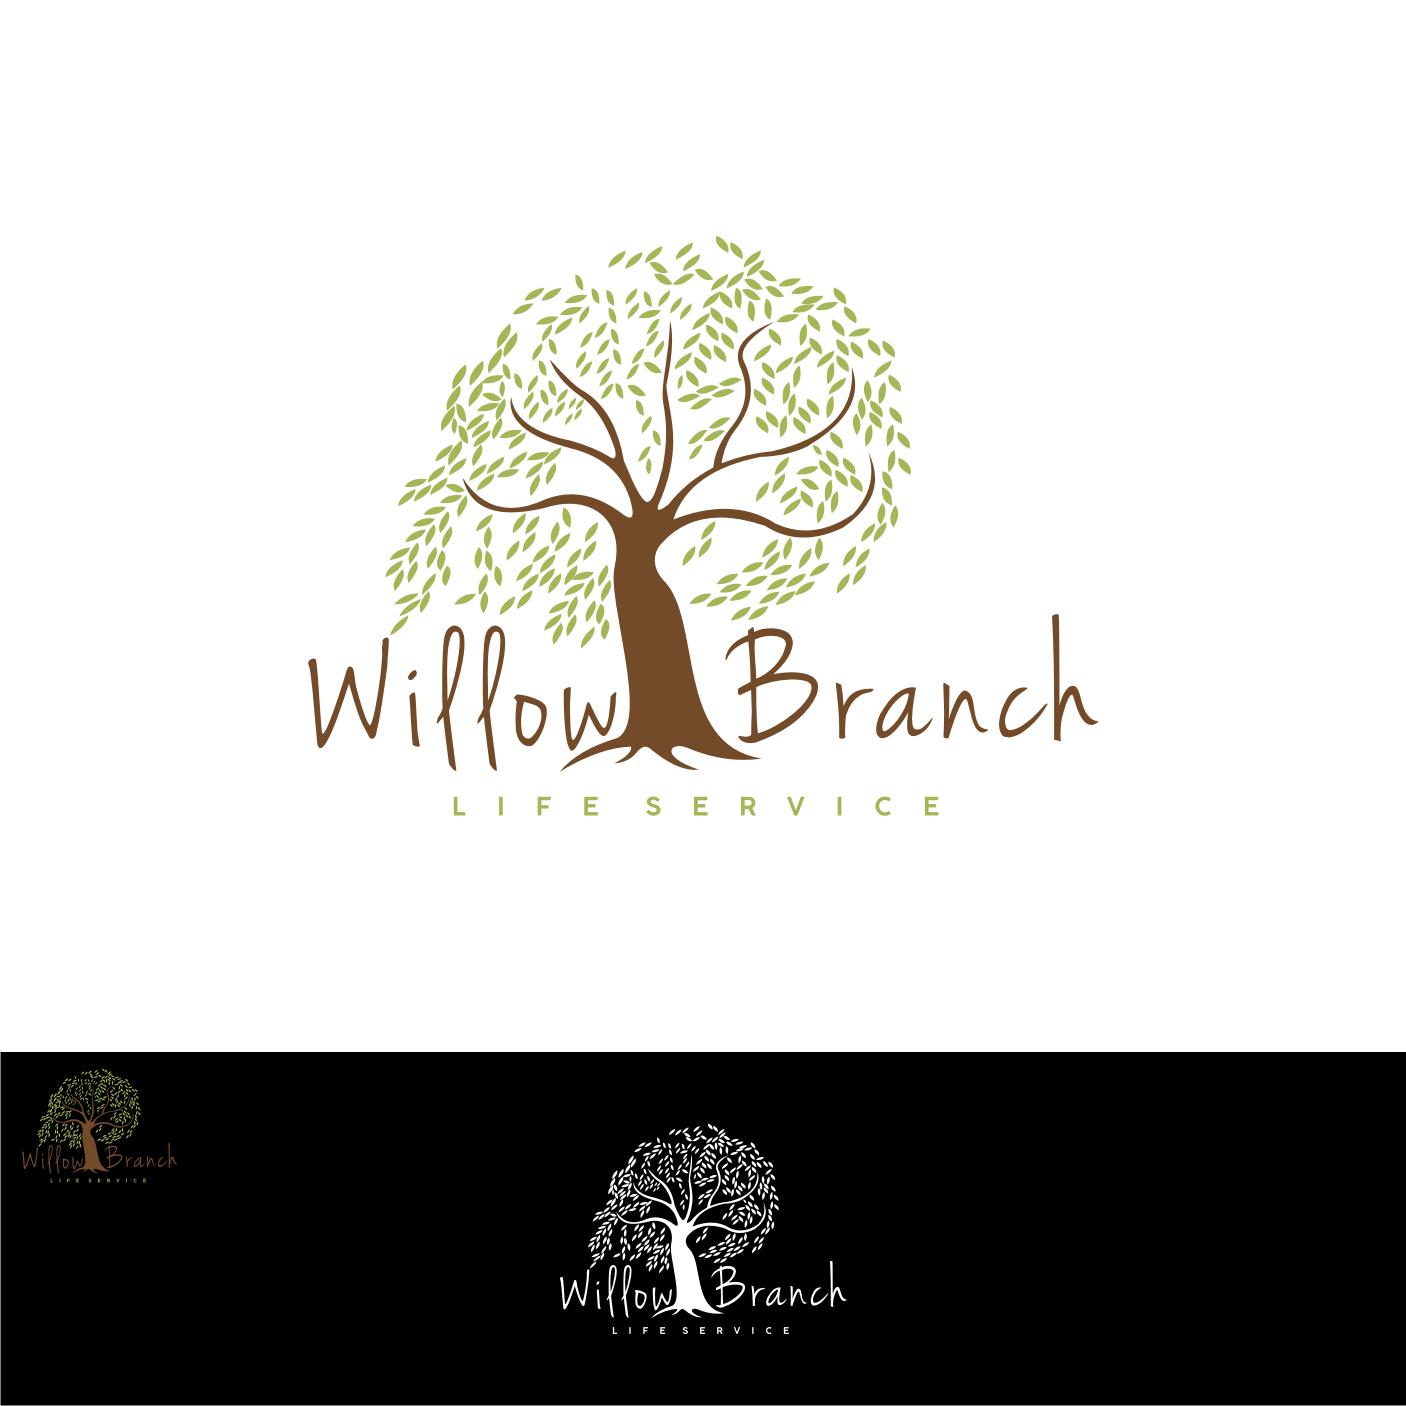 Logo Design by Analla Art - Entry No. 143 in the Logo Design Contest Artistic Logo Design for Willow Branch Life Service.